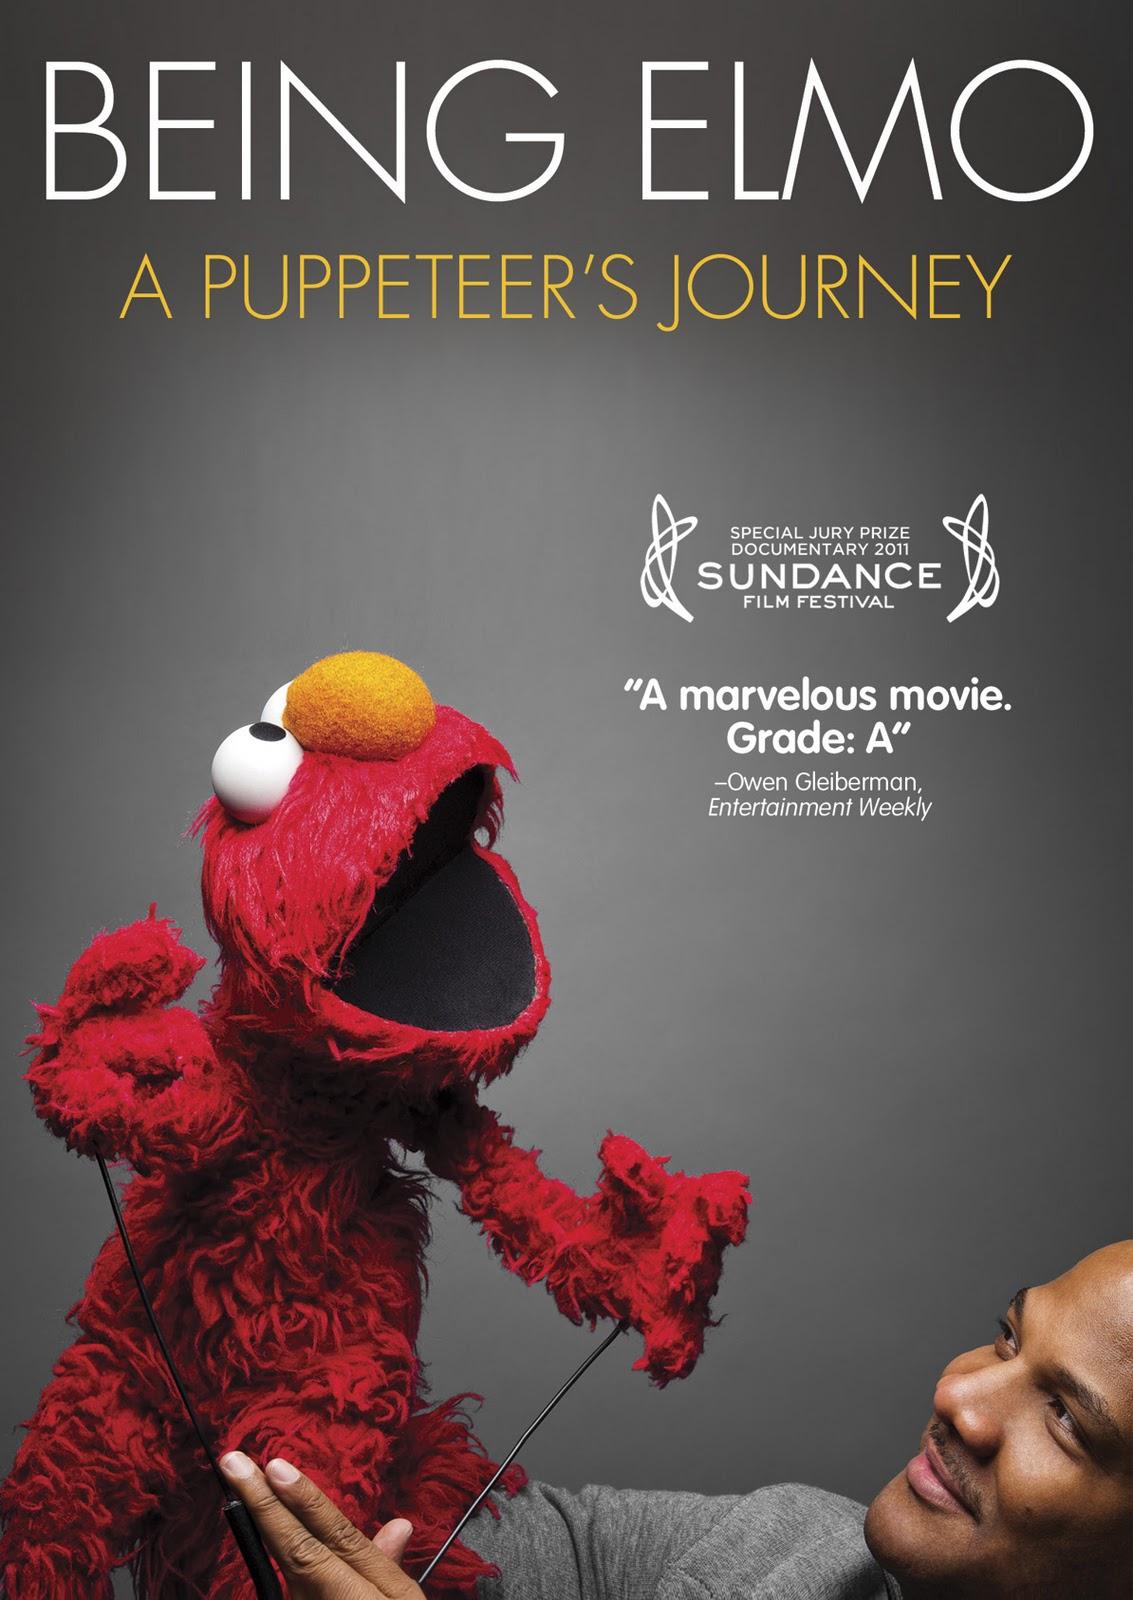 affiche du film Being Elmo: A Puppeteer's Journey